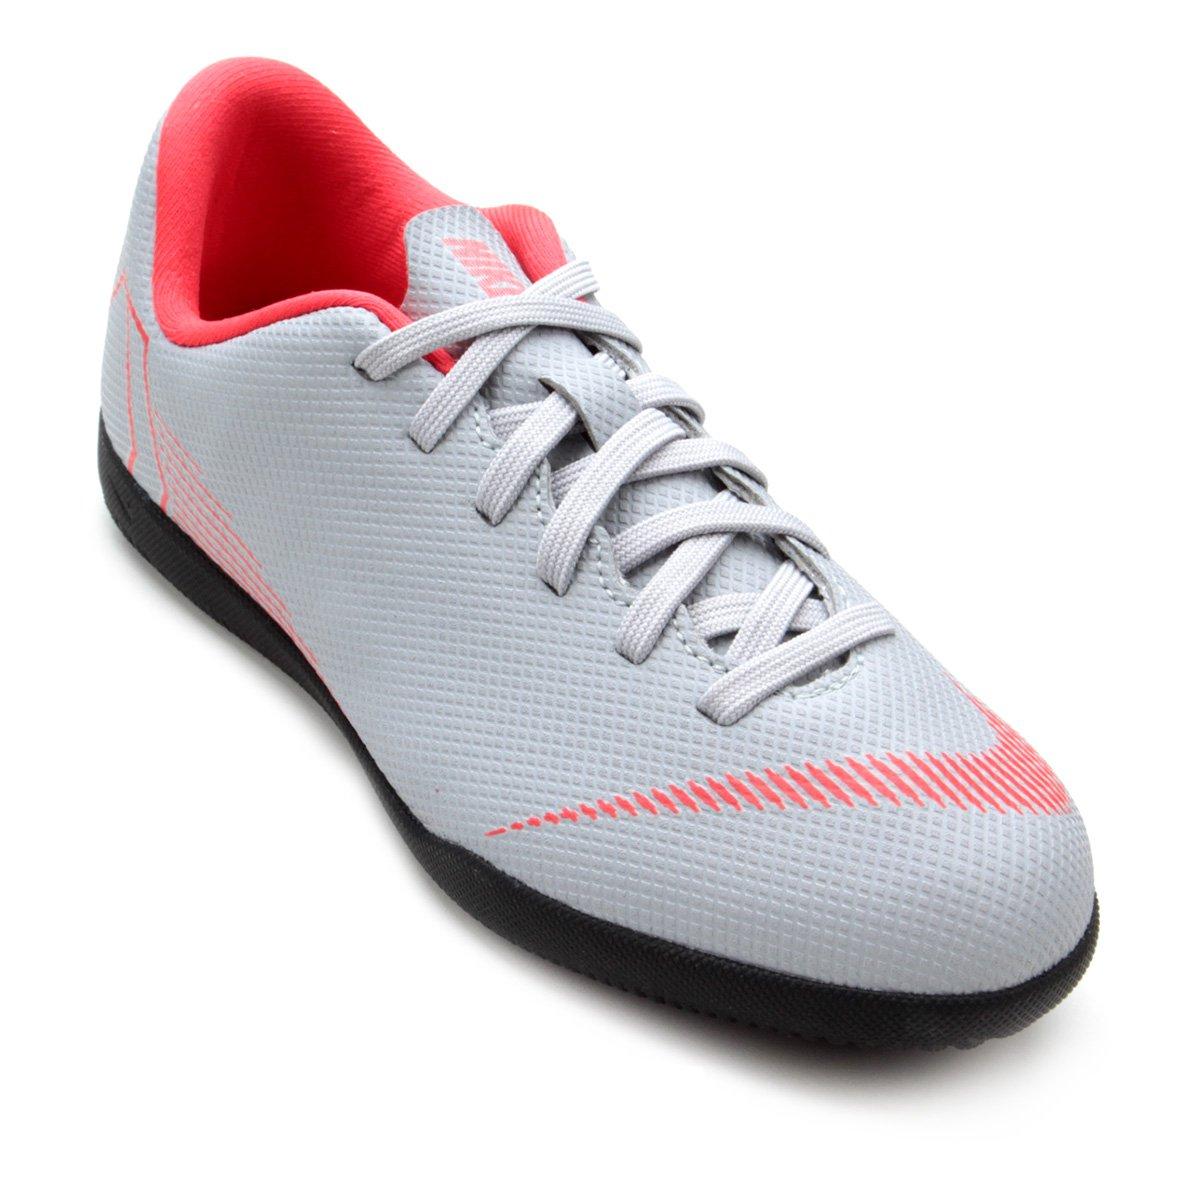 3c25a79d34191 Chuteira Futsal Infantil Nike Mercurial Vapor 12 Club - Cinza - Compre  Agora